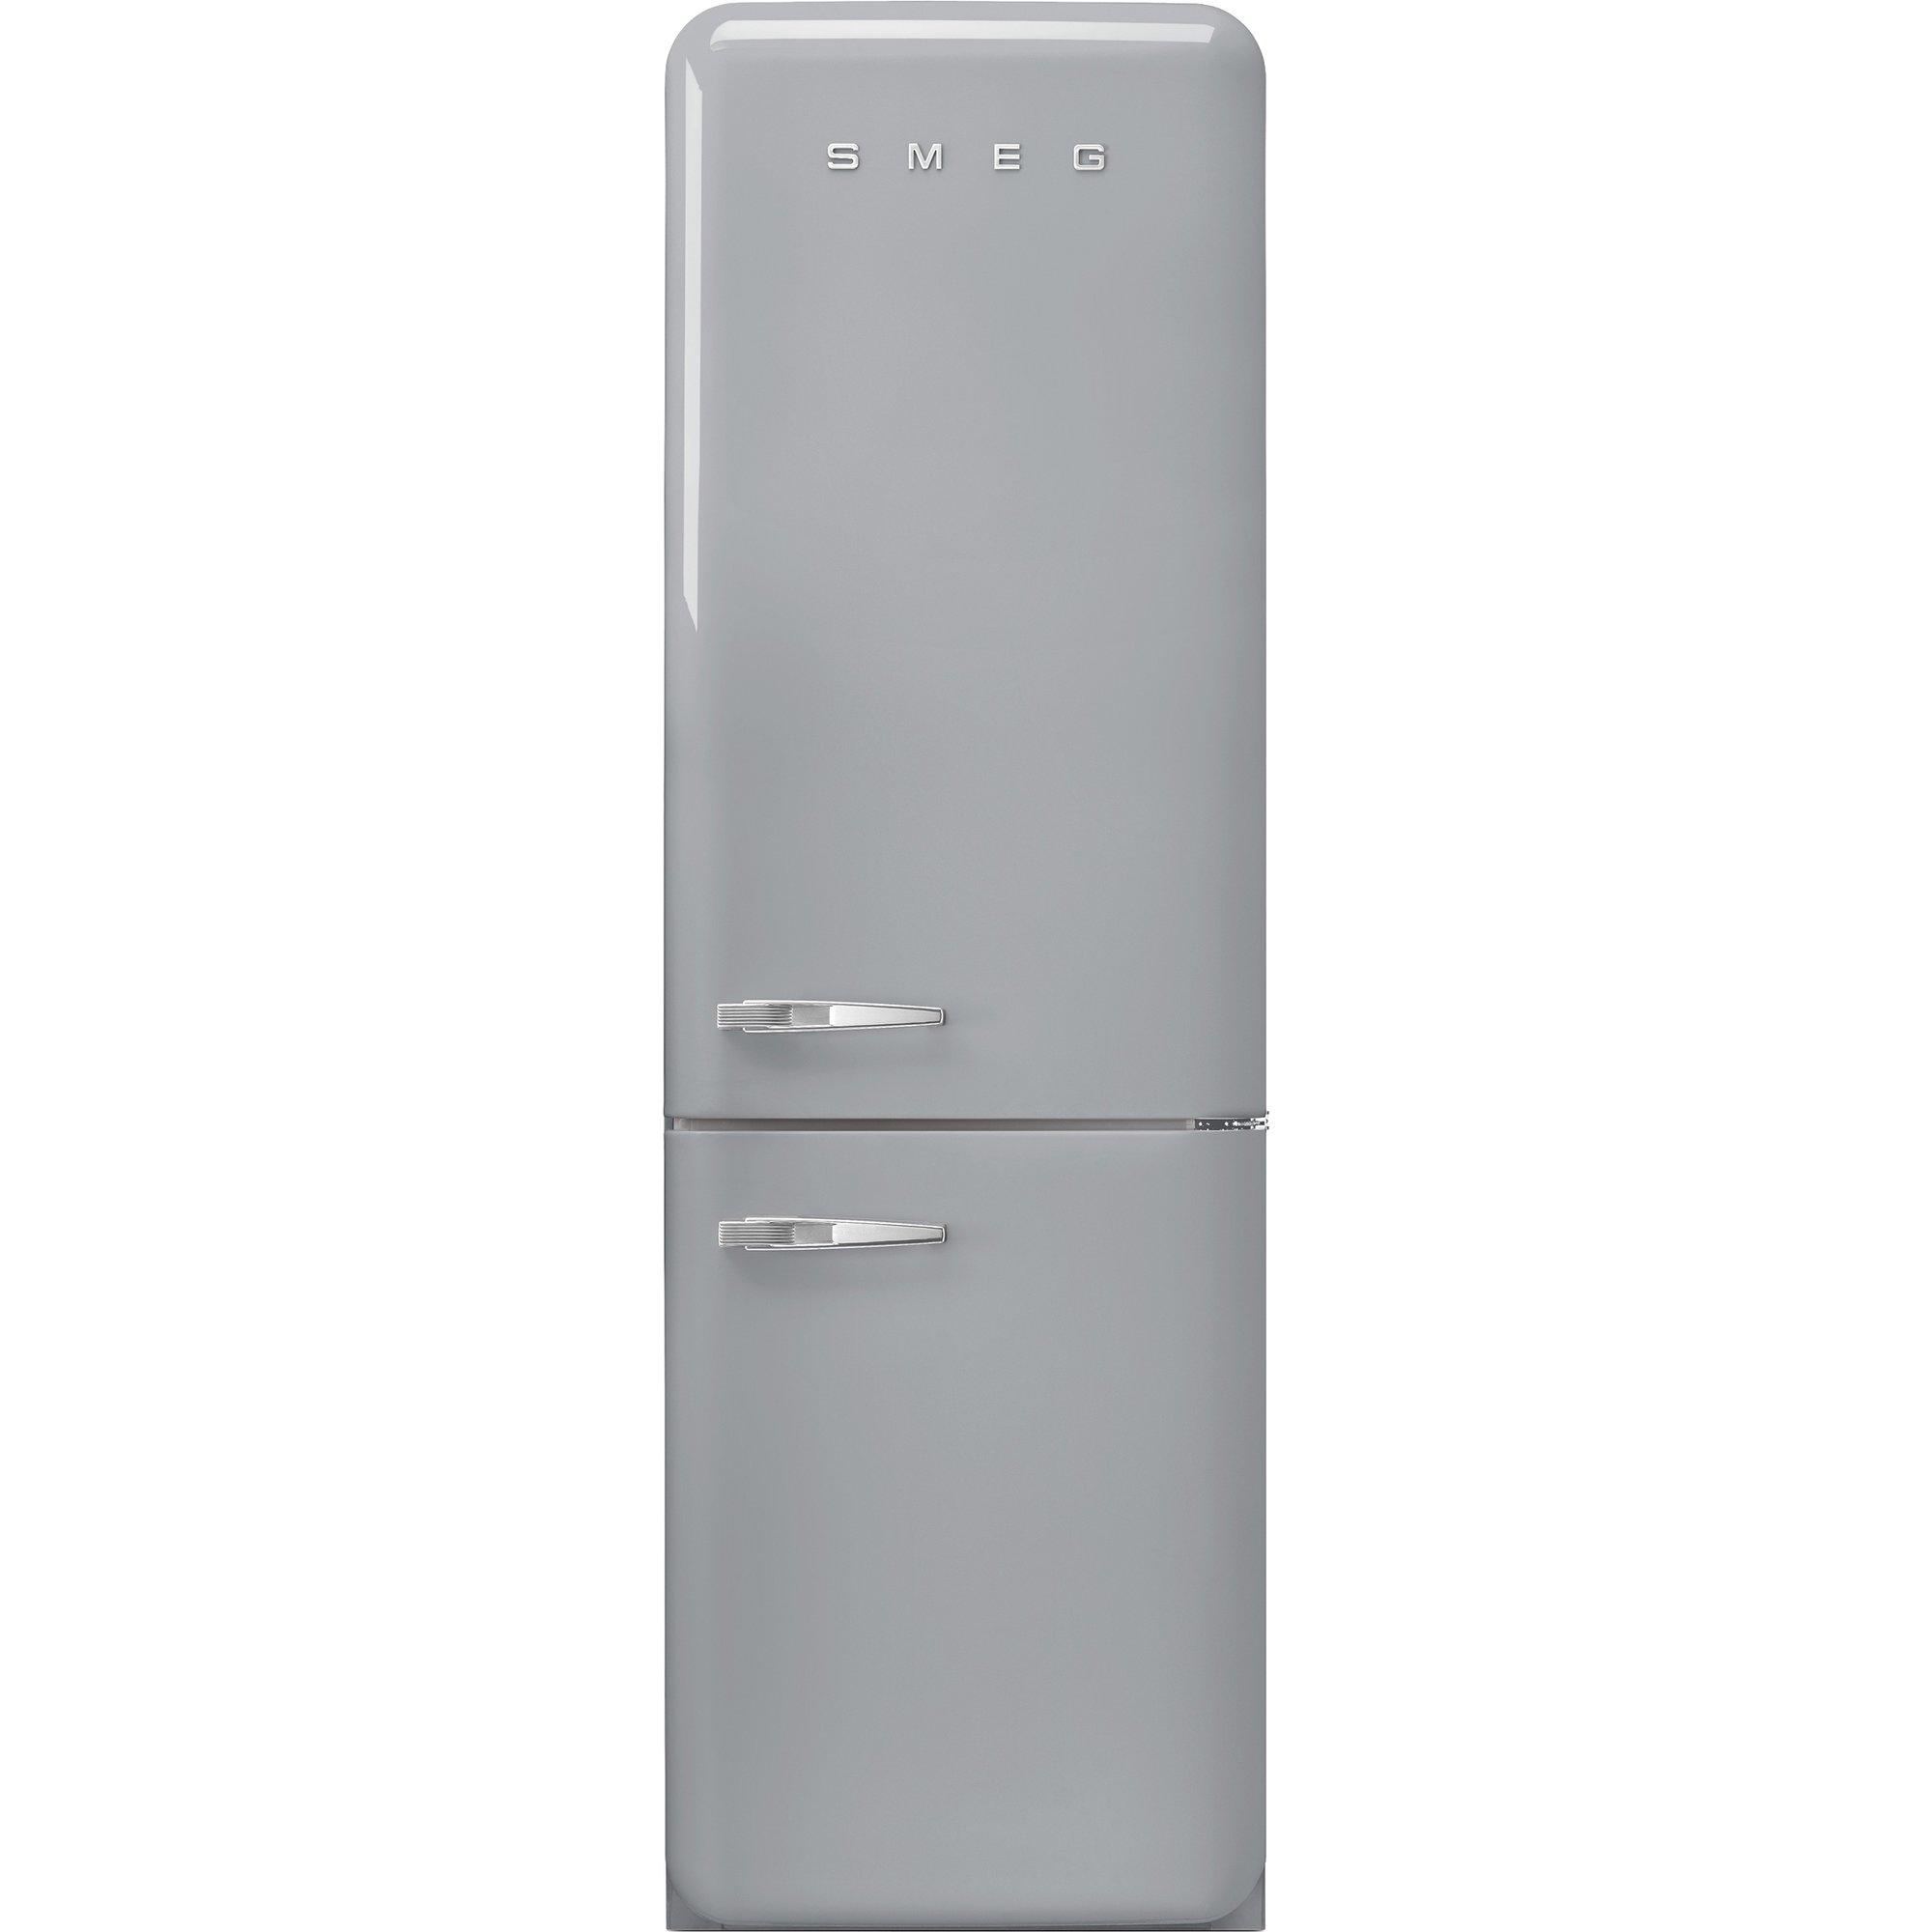 Smeg Kylskåp/frys i retrodesign högerhängt silvergå